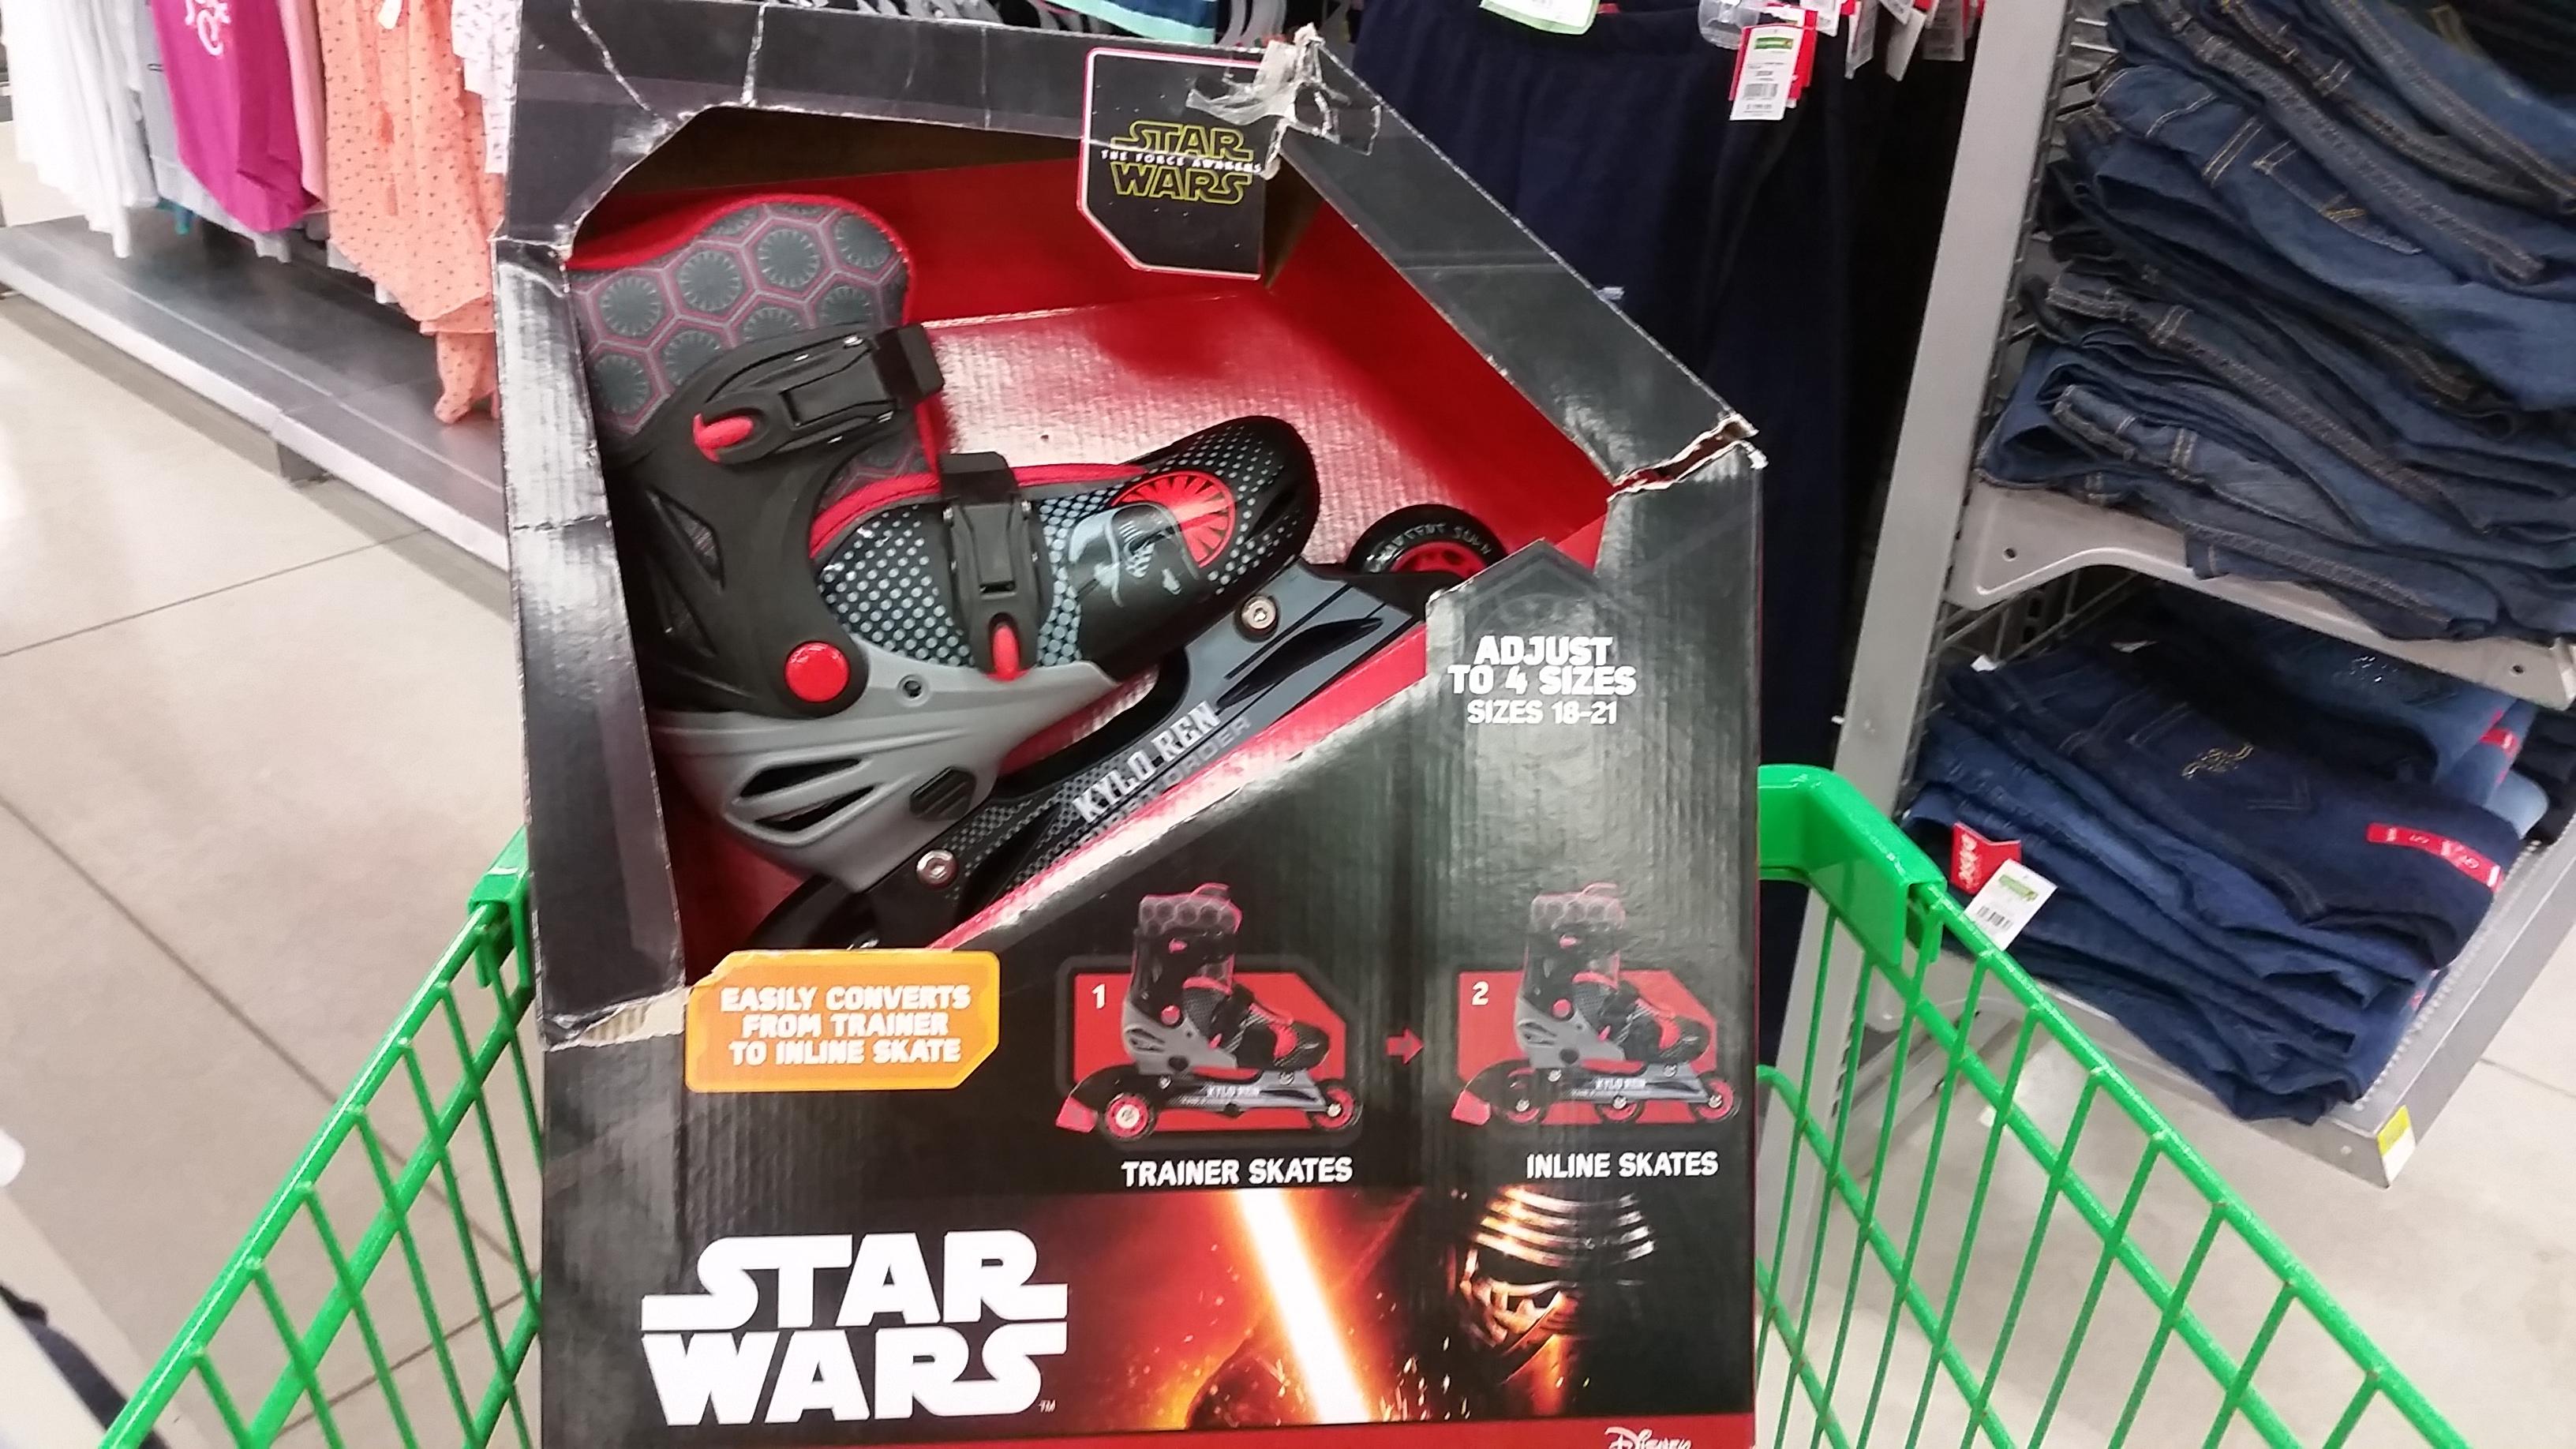 Bodega Aurrerá: Patín convertible Star Wars a $325.03